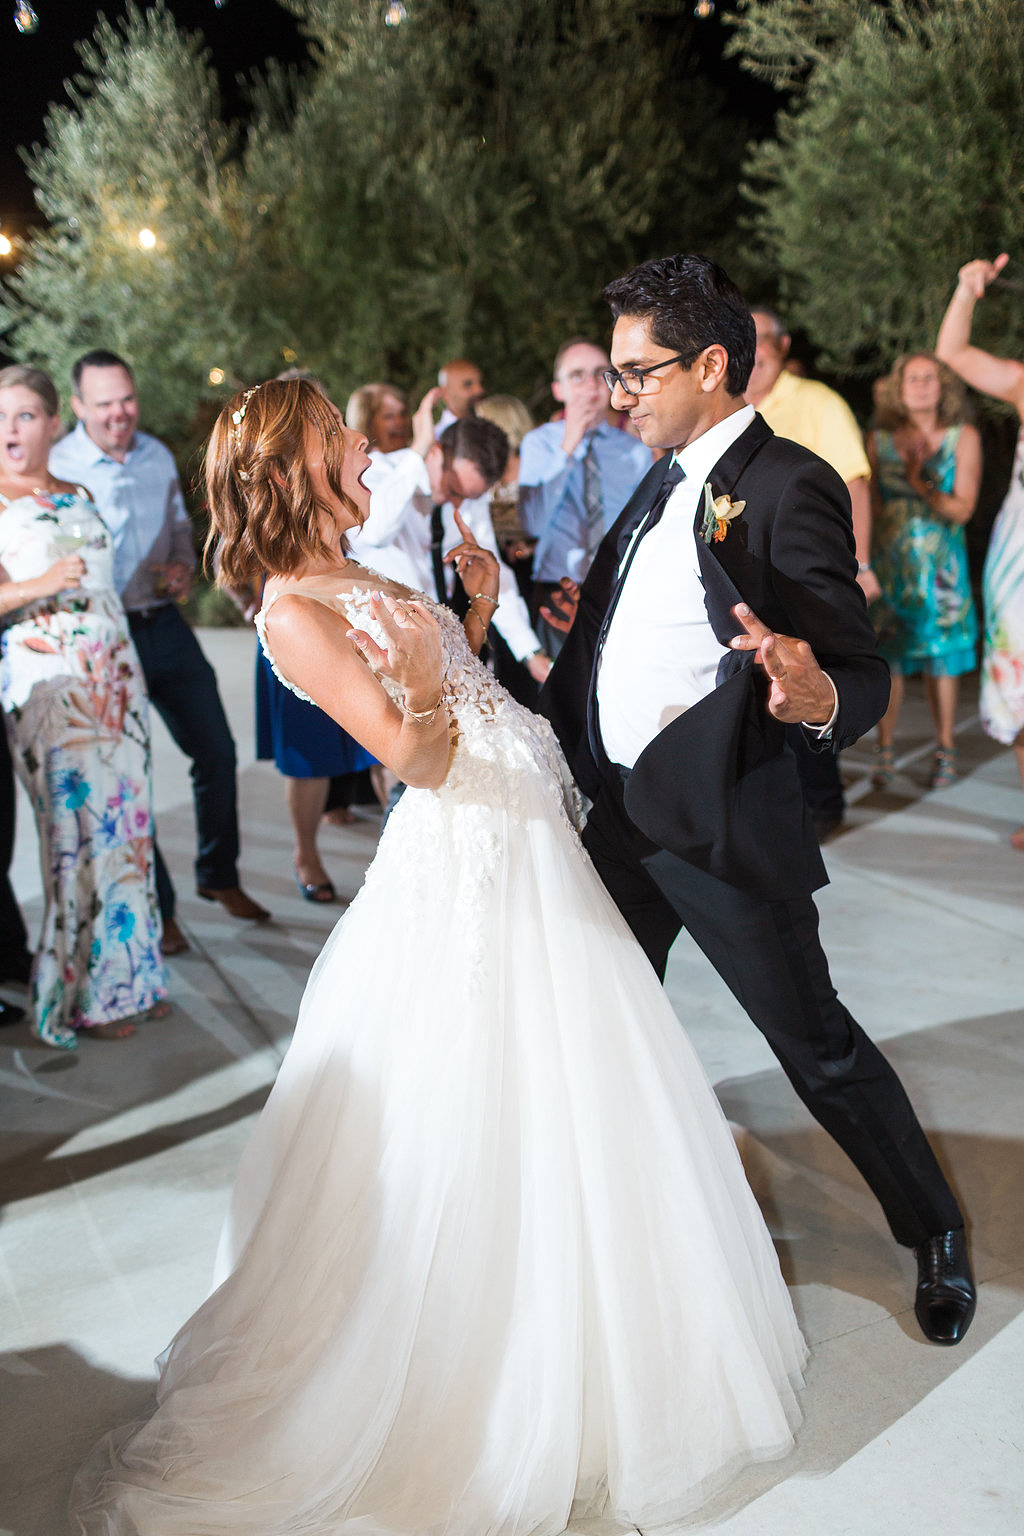 emily adhir wedding dancing couple